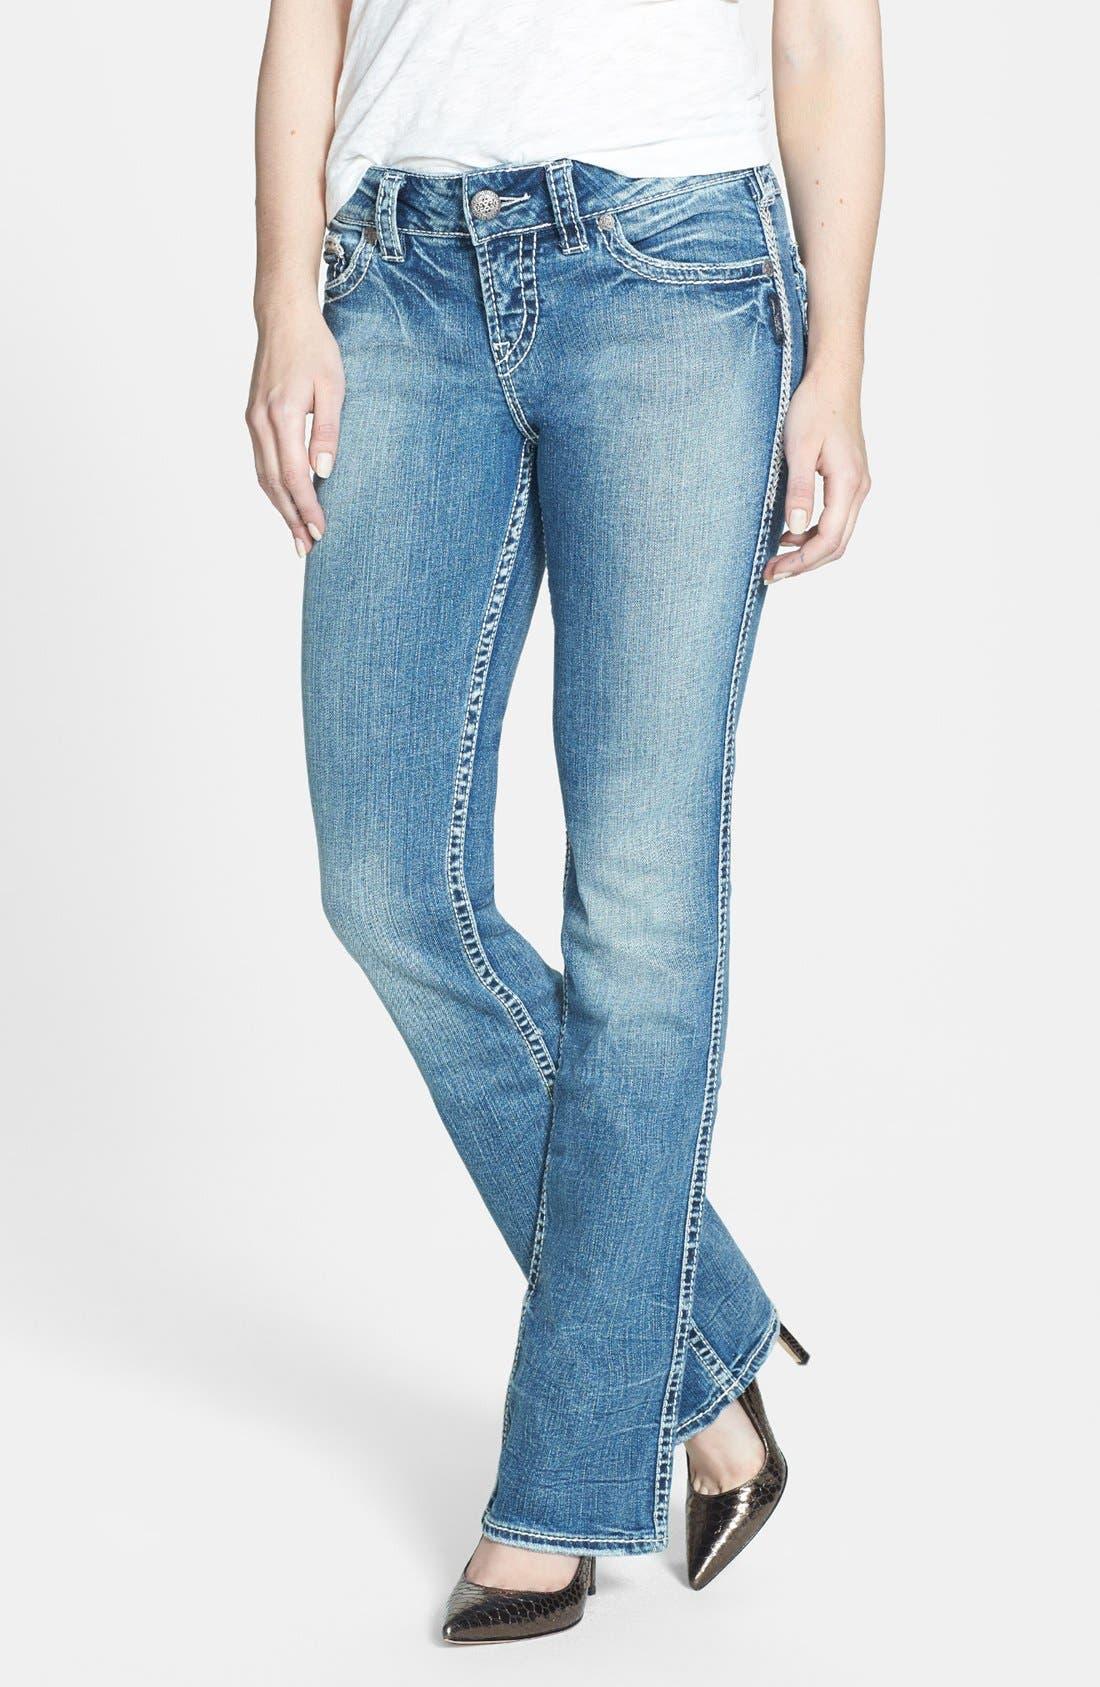 Main Image - Silver Jeans Co. 'Suki' Flap Pocket Bootcut Jeans (Indigo)